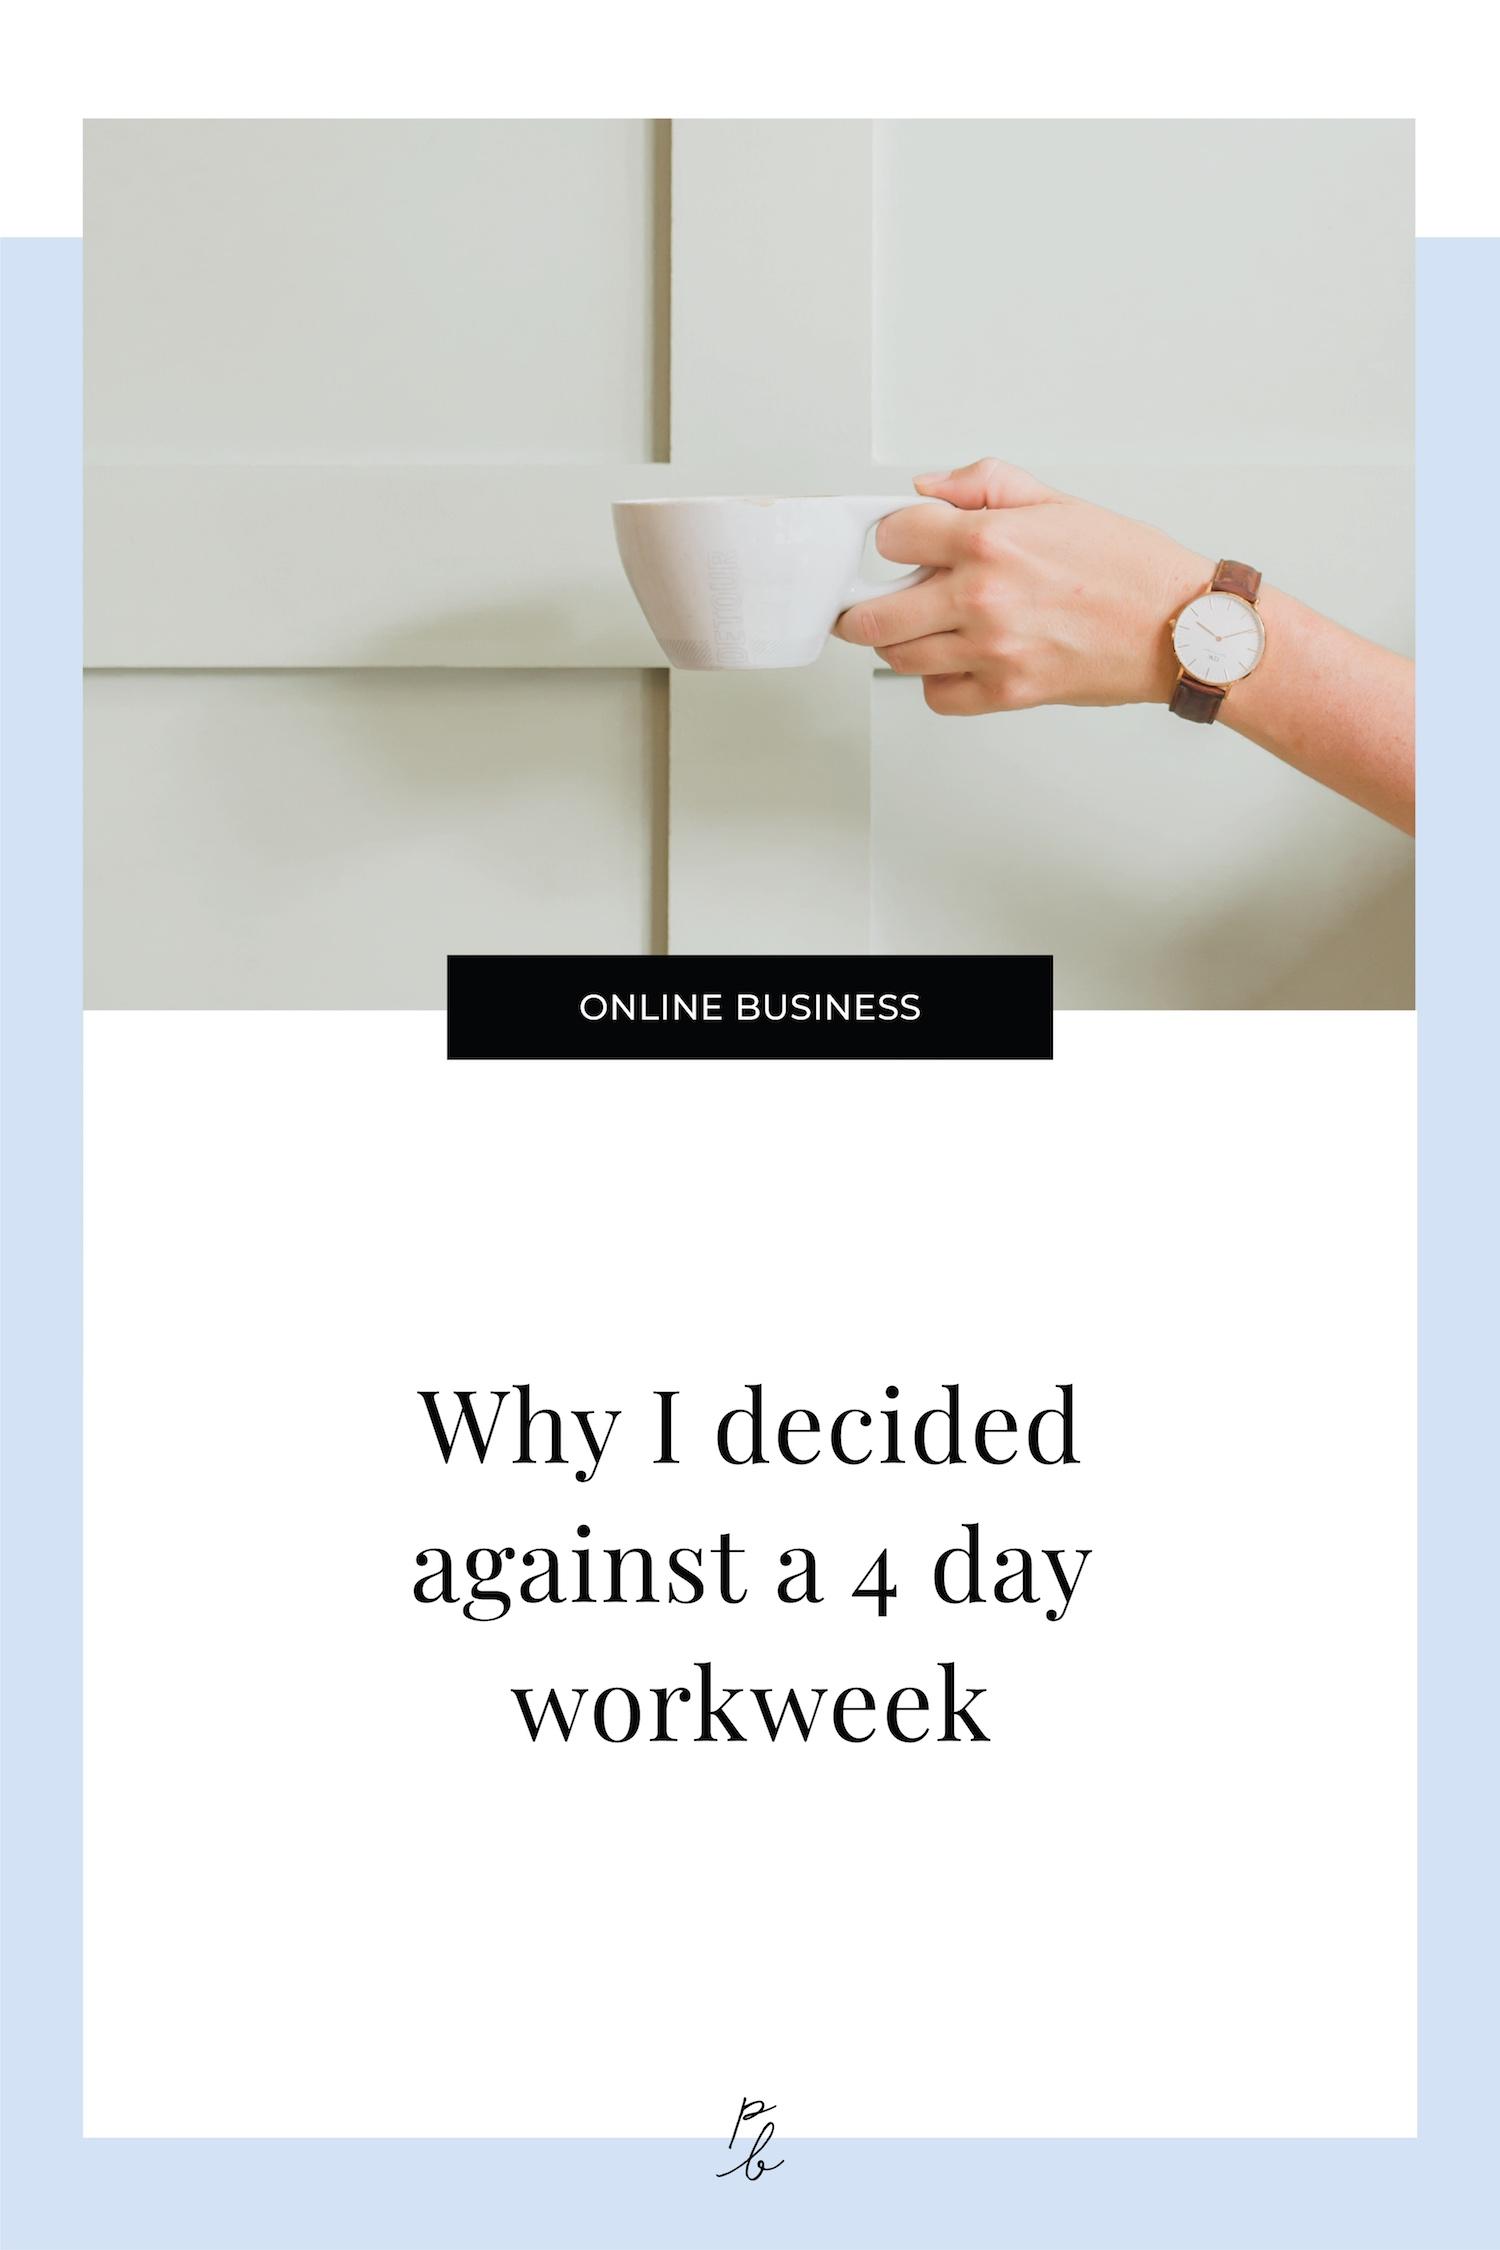 why I decided against a 4 day workweek-88.jpg